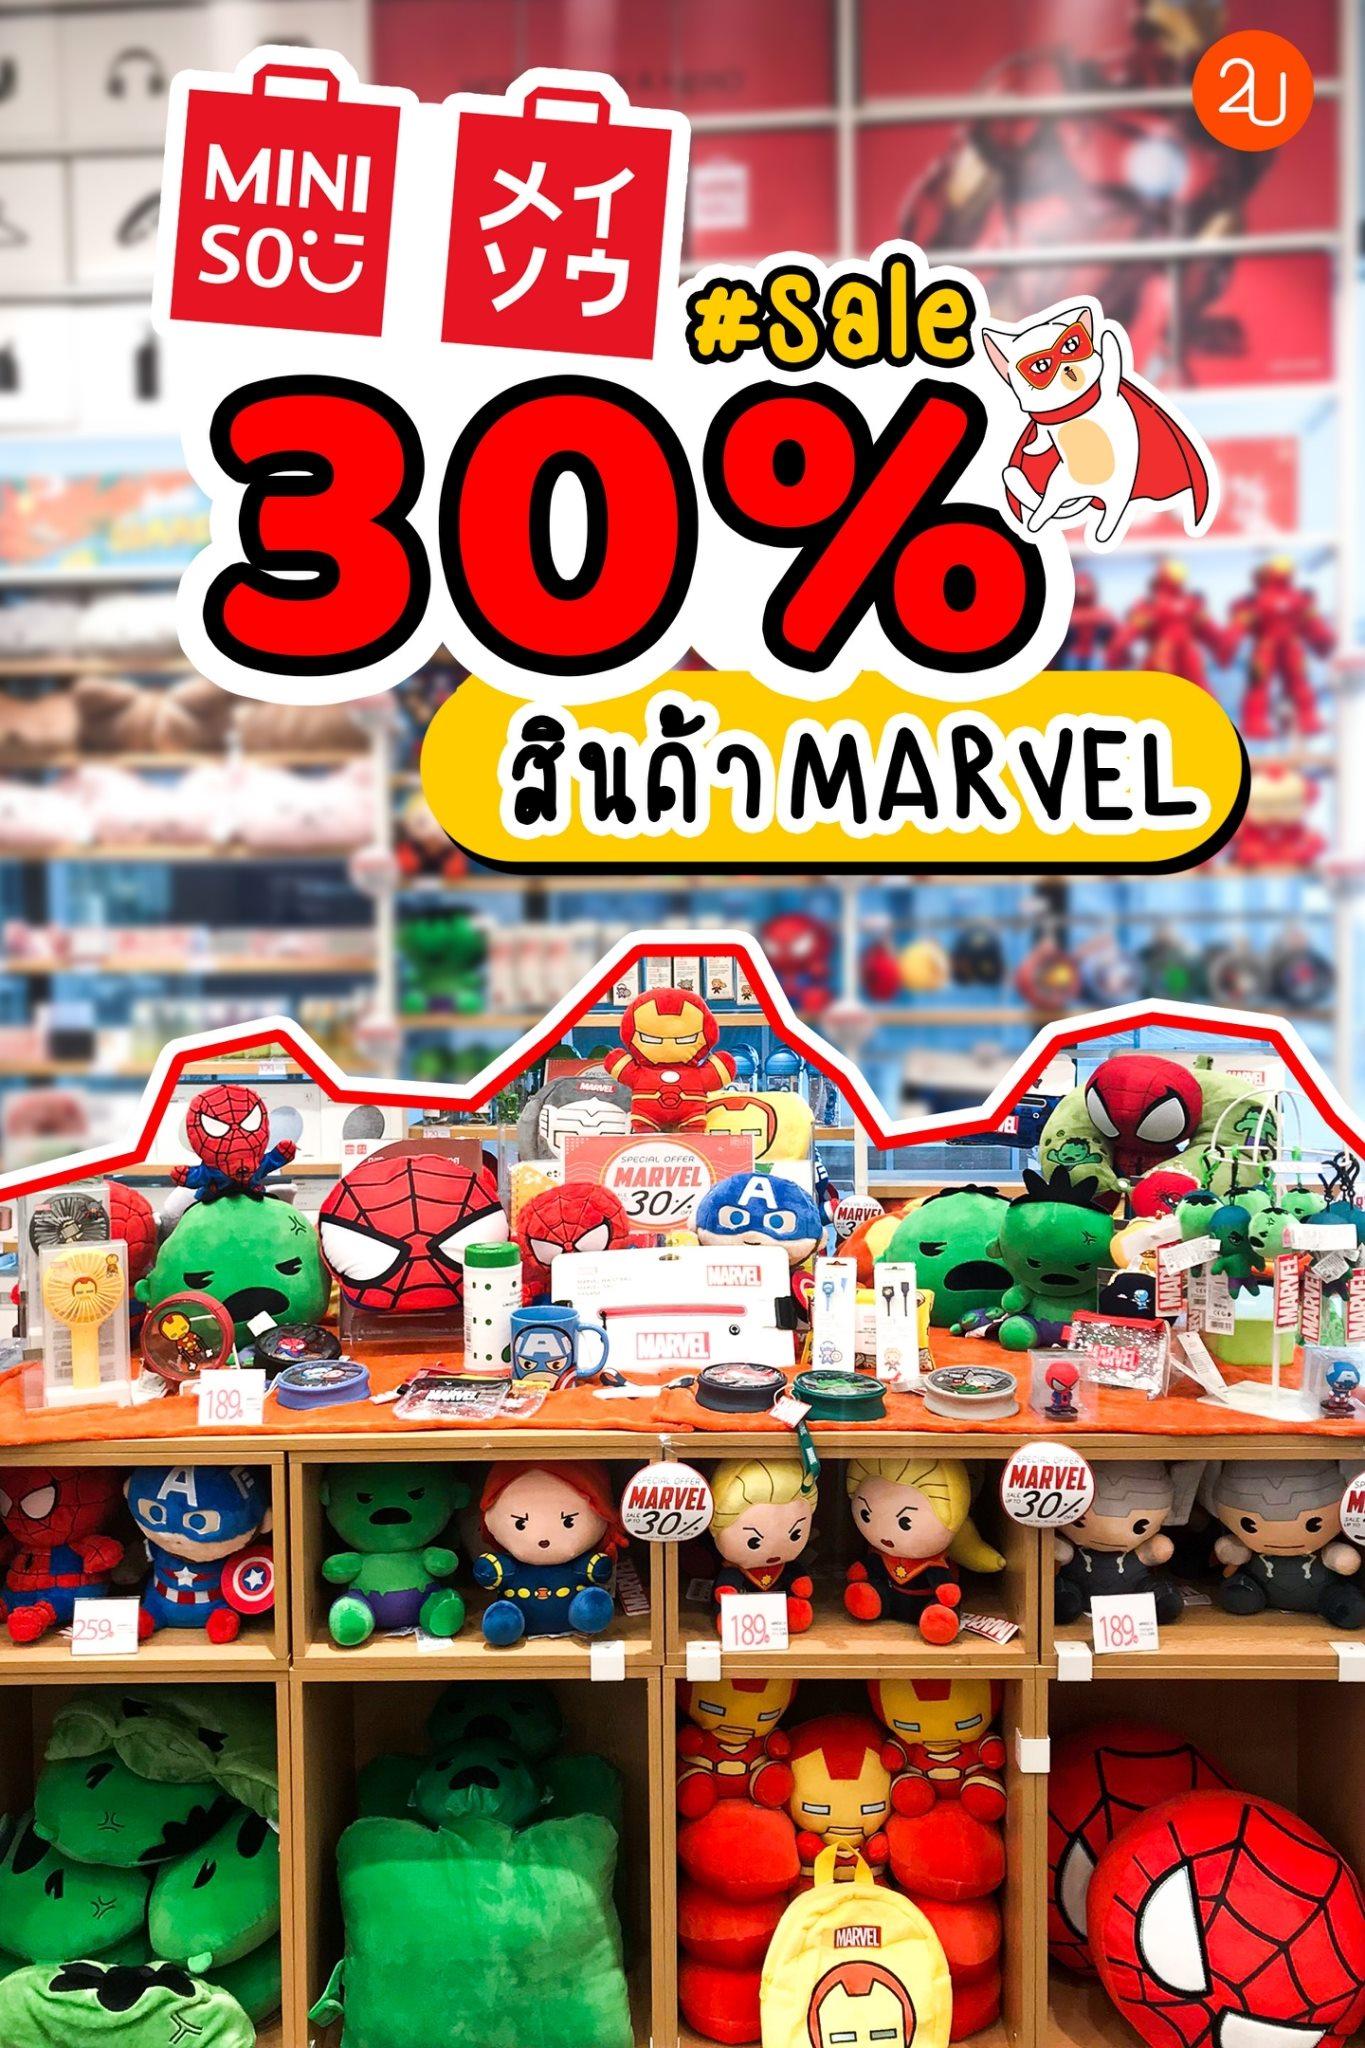 MINISO X MARVEL sale 30